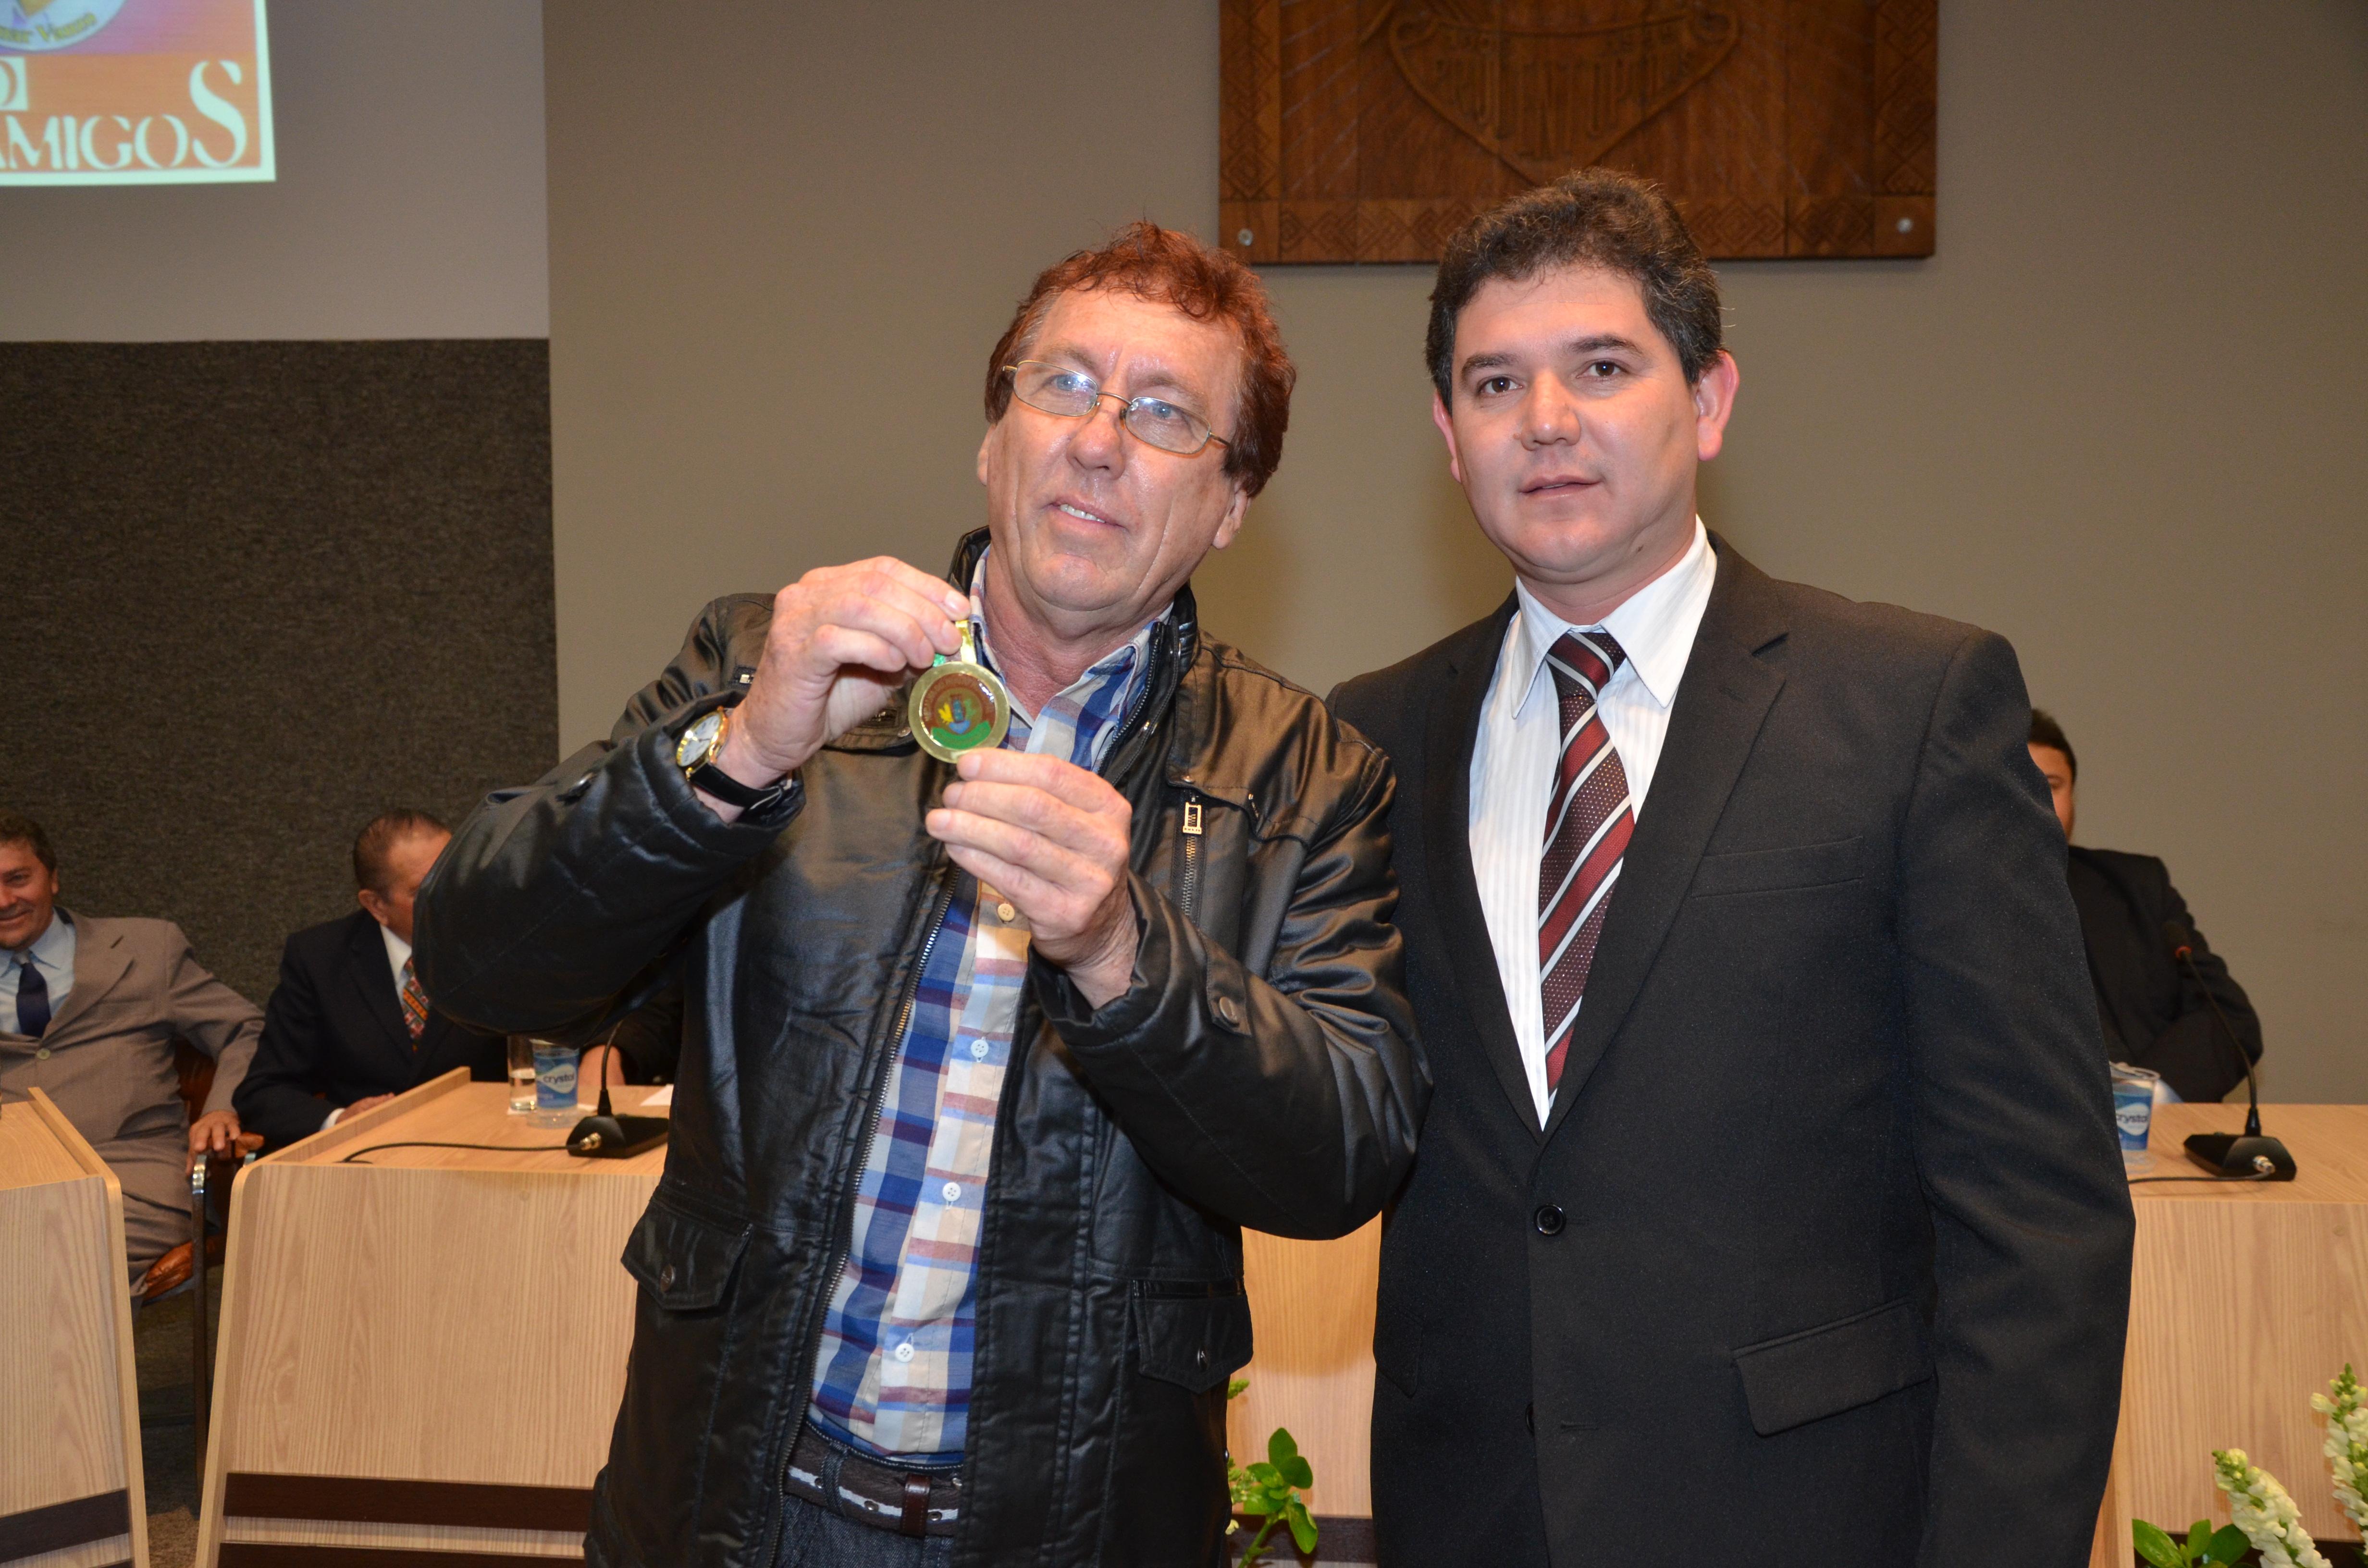 Vereador Adriano Cardozo entrega a medalha ao M�sico e Radialista Leonel Miketchen